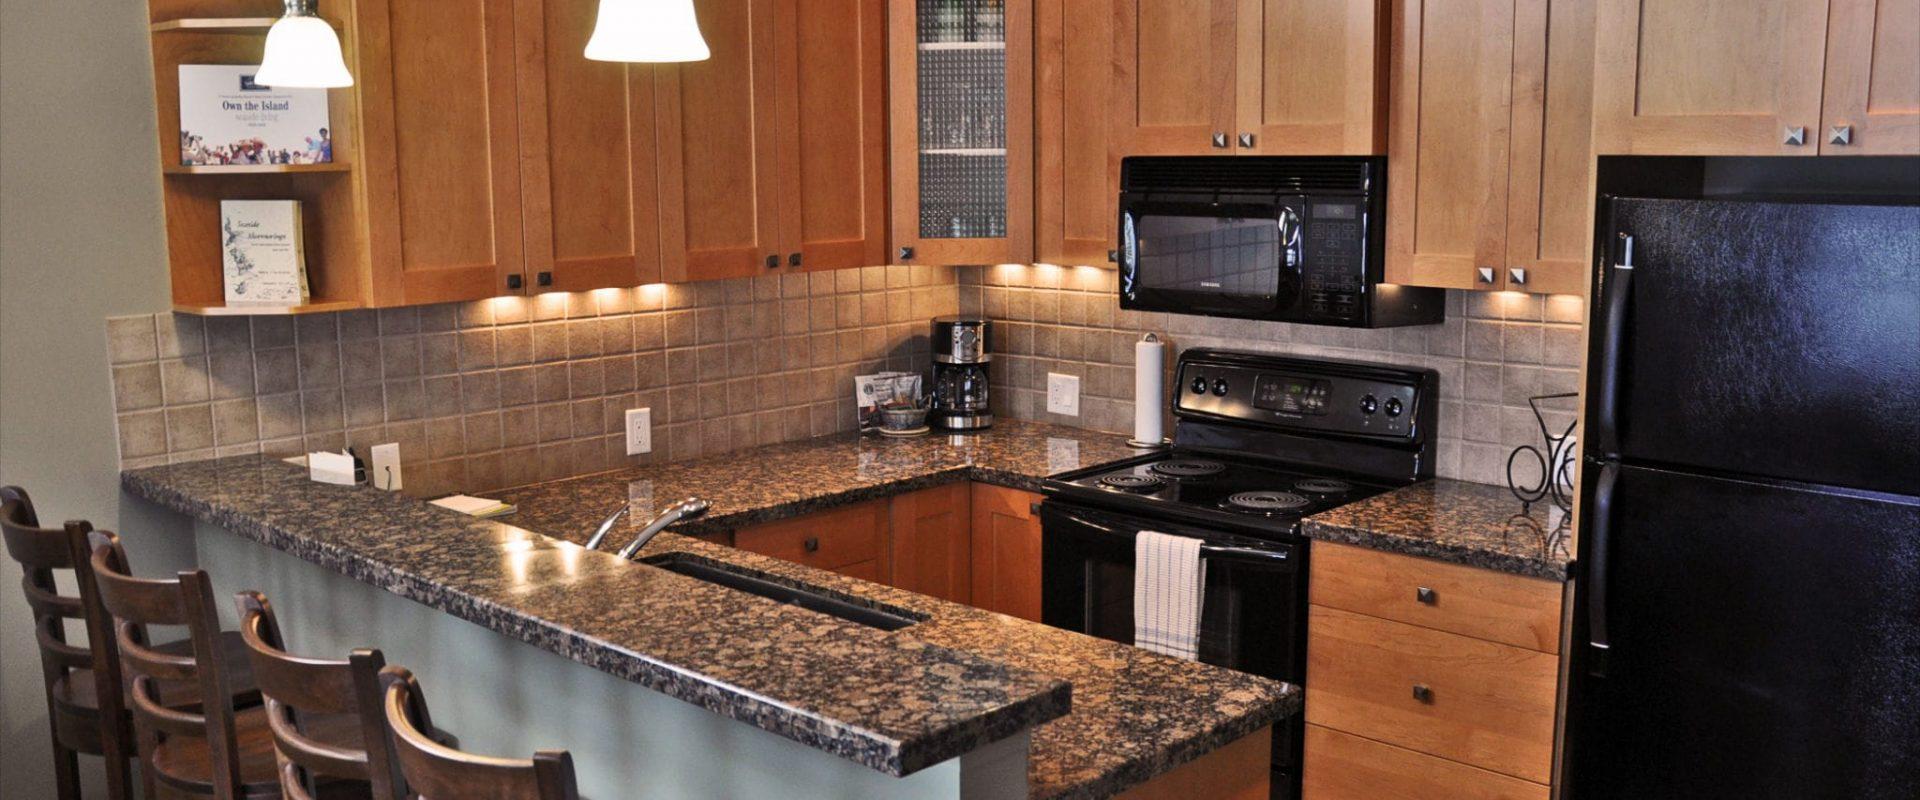 2-bedroom-penthouse-kitchen